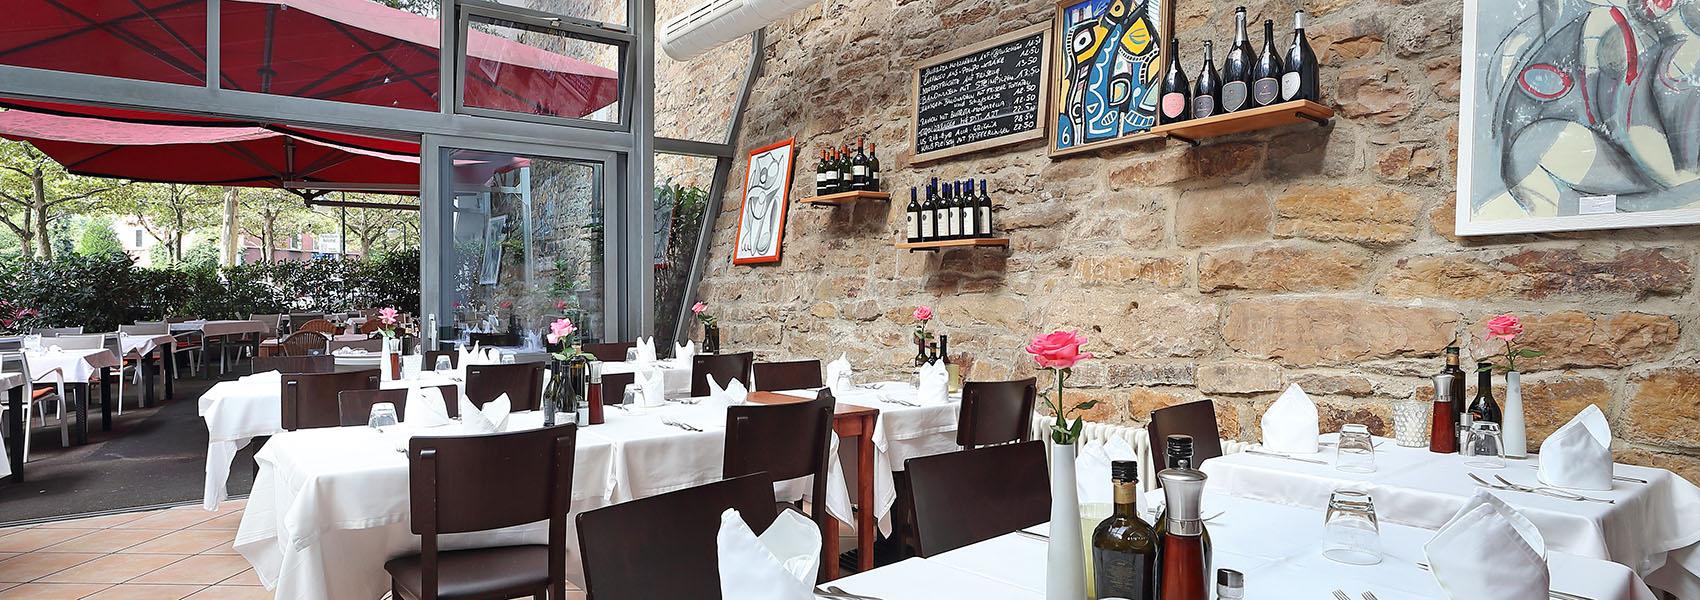 ristorante-pfauen-reutlingen-innen-stadtmauer